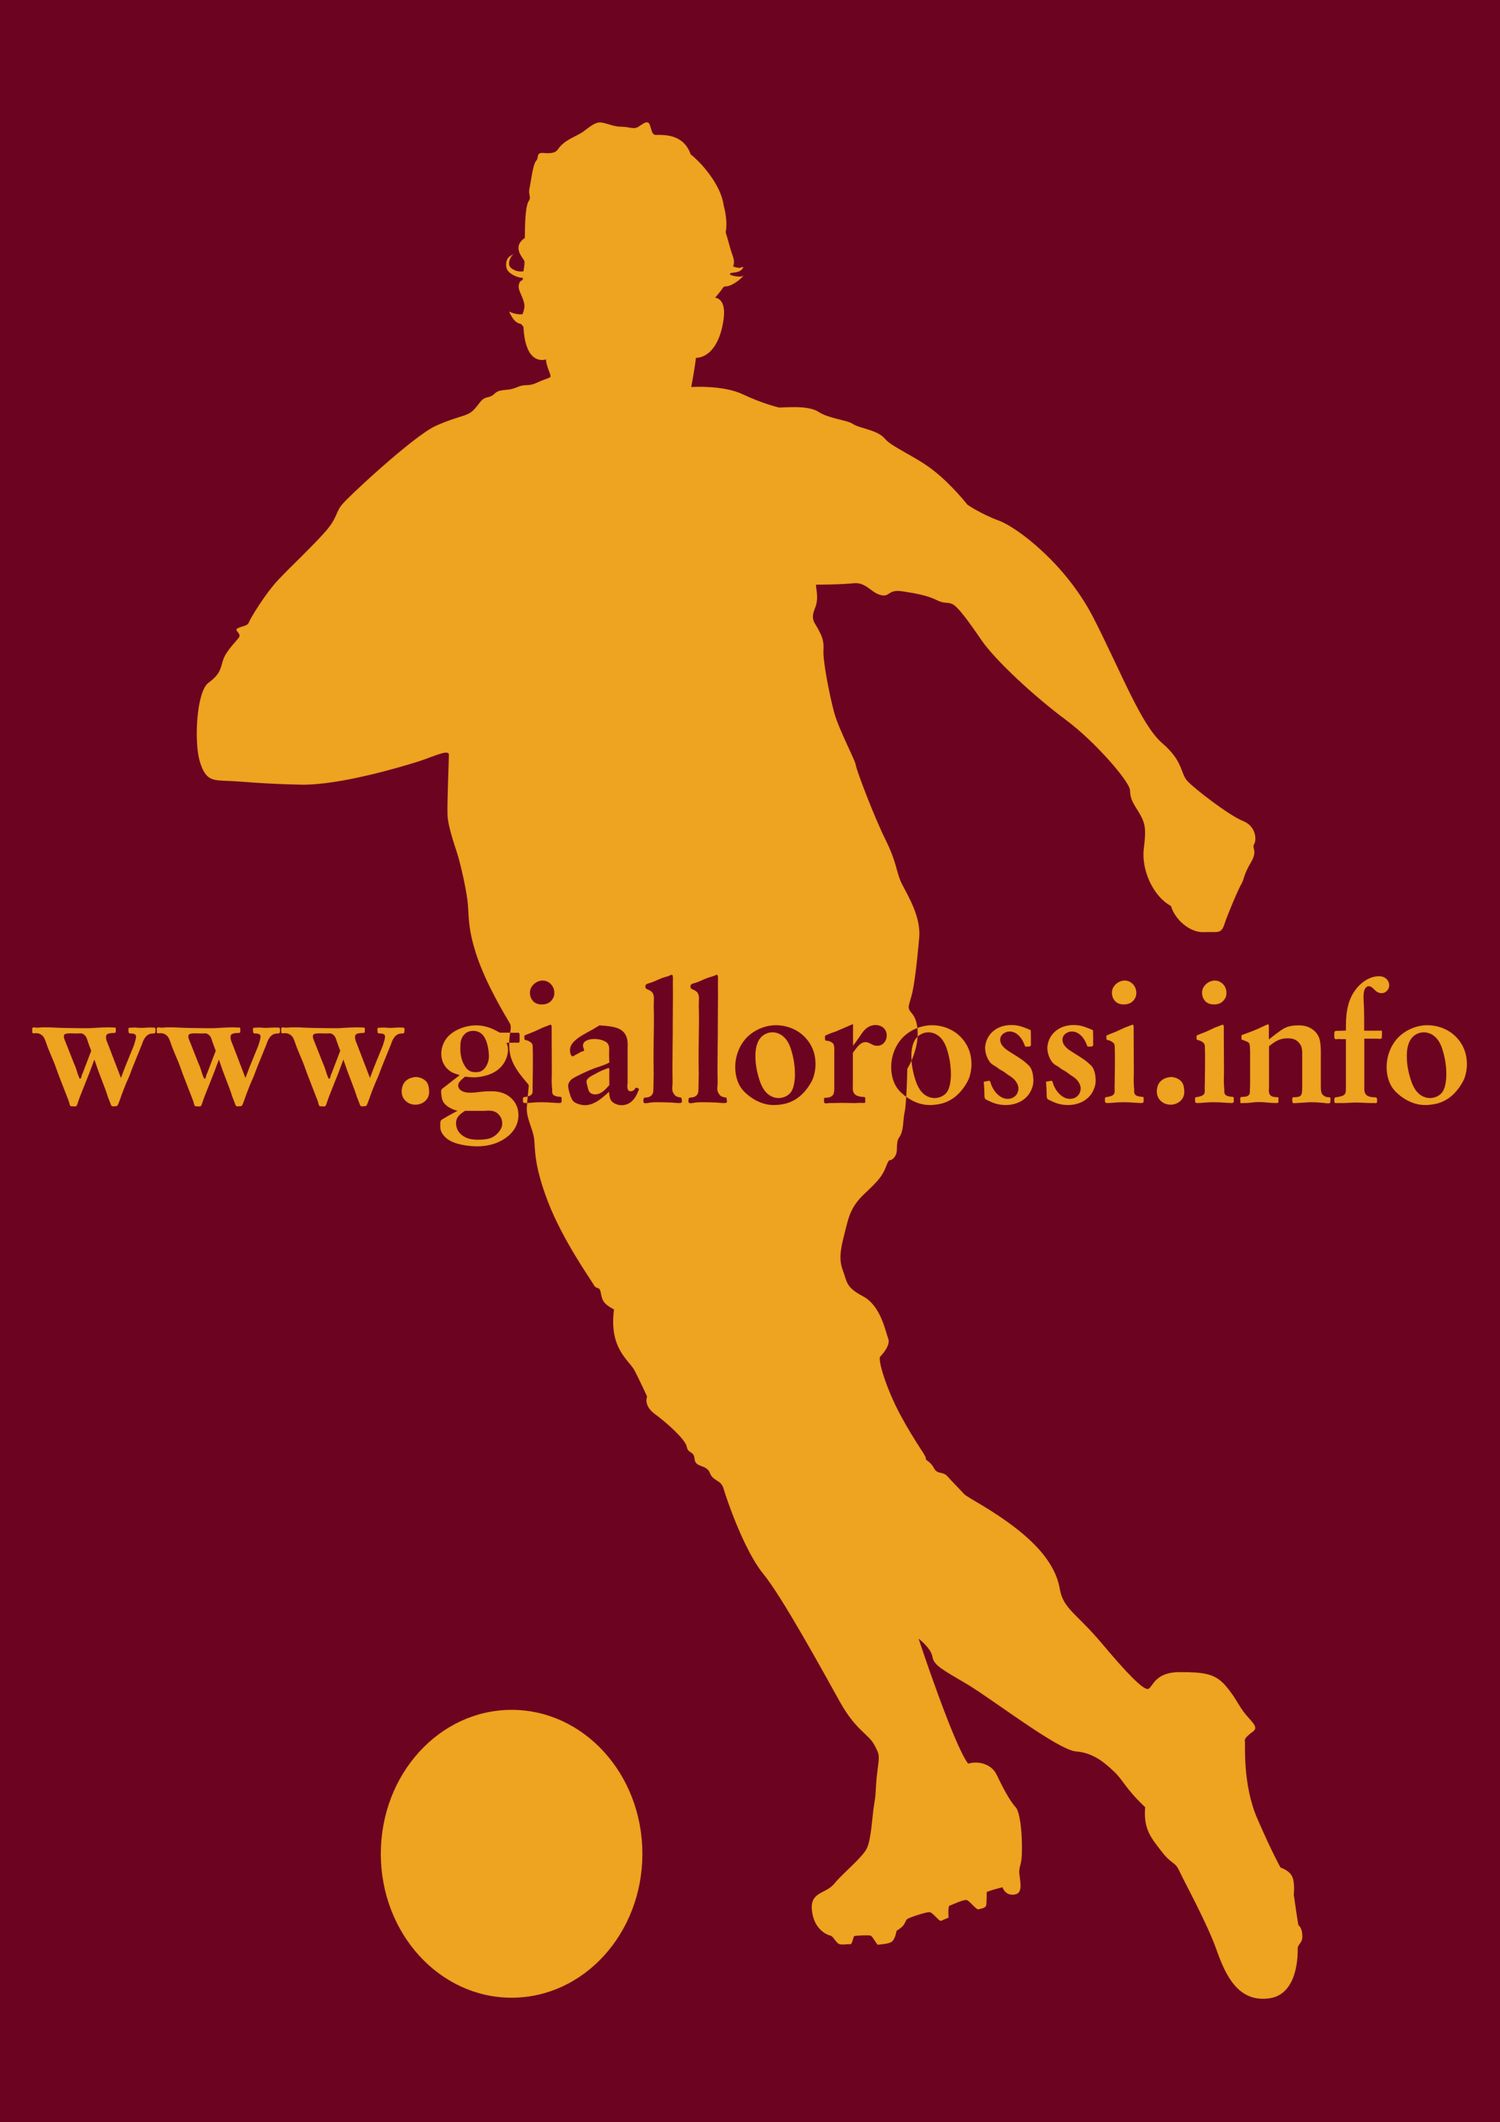 Giallorossi - Poster mancante